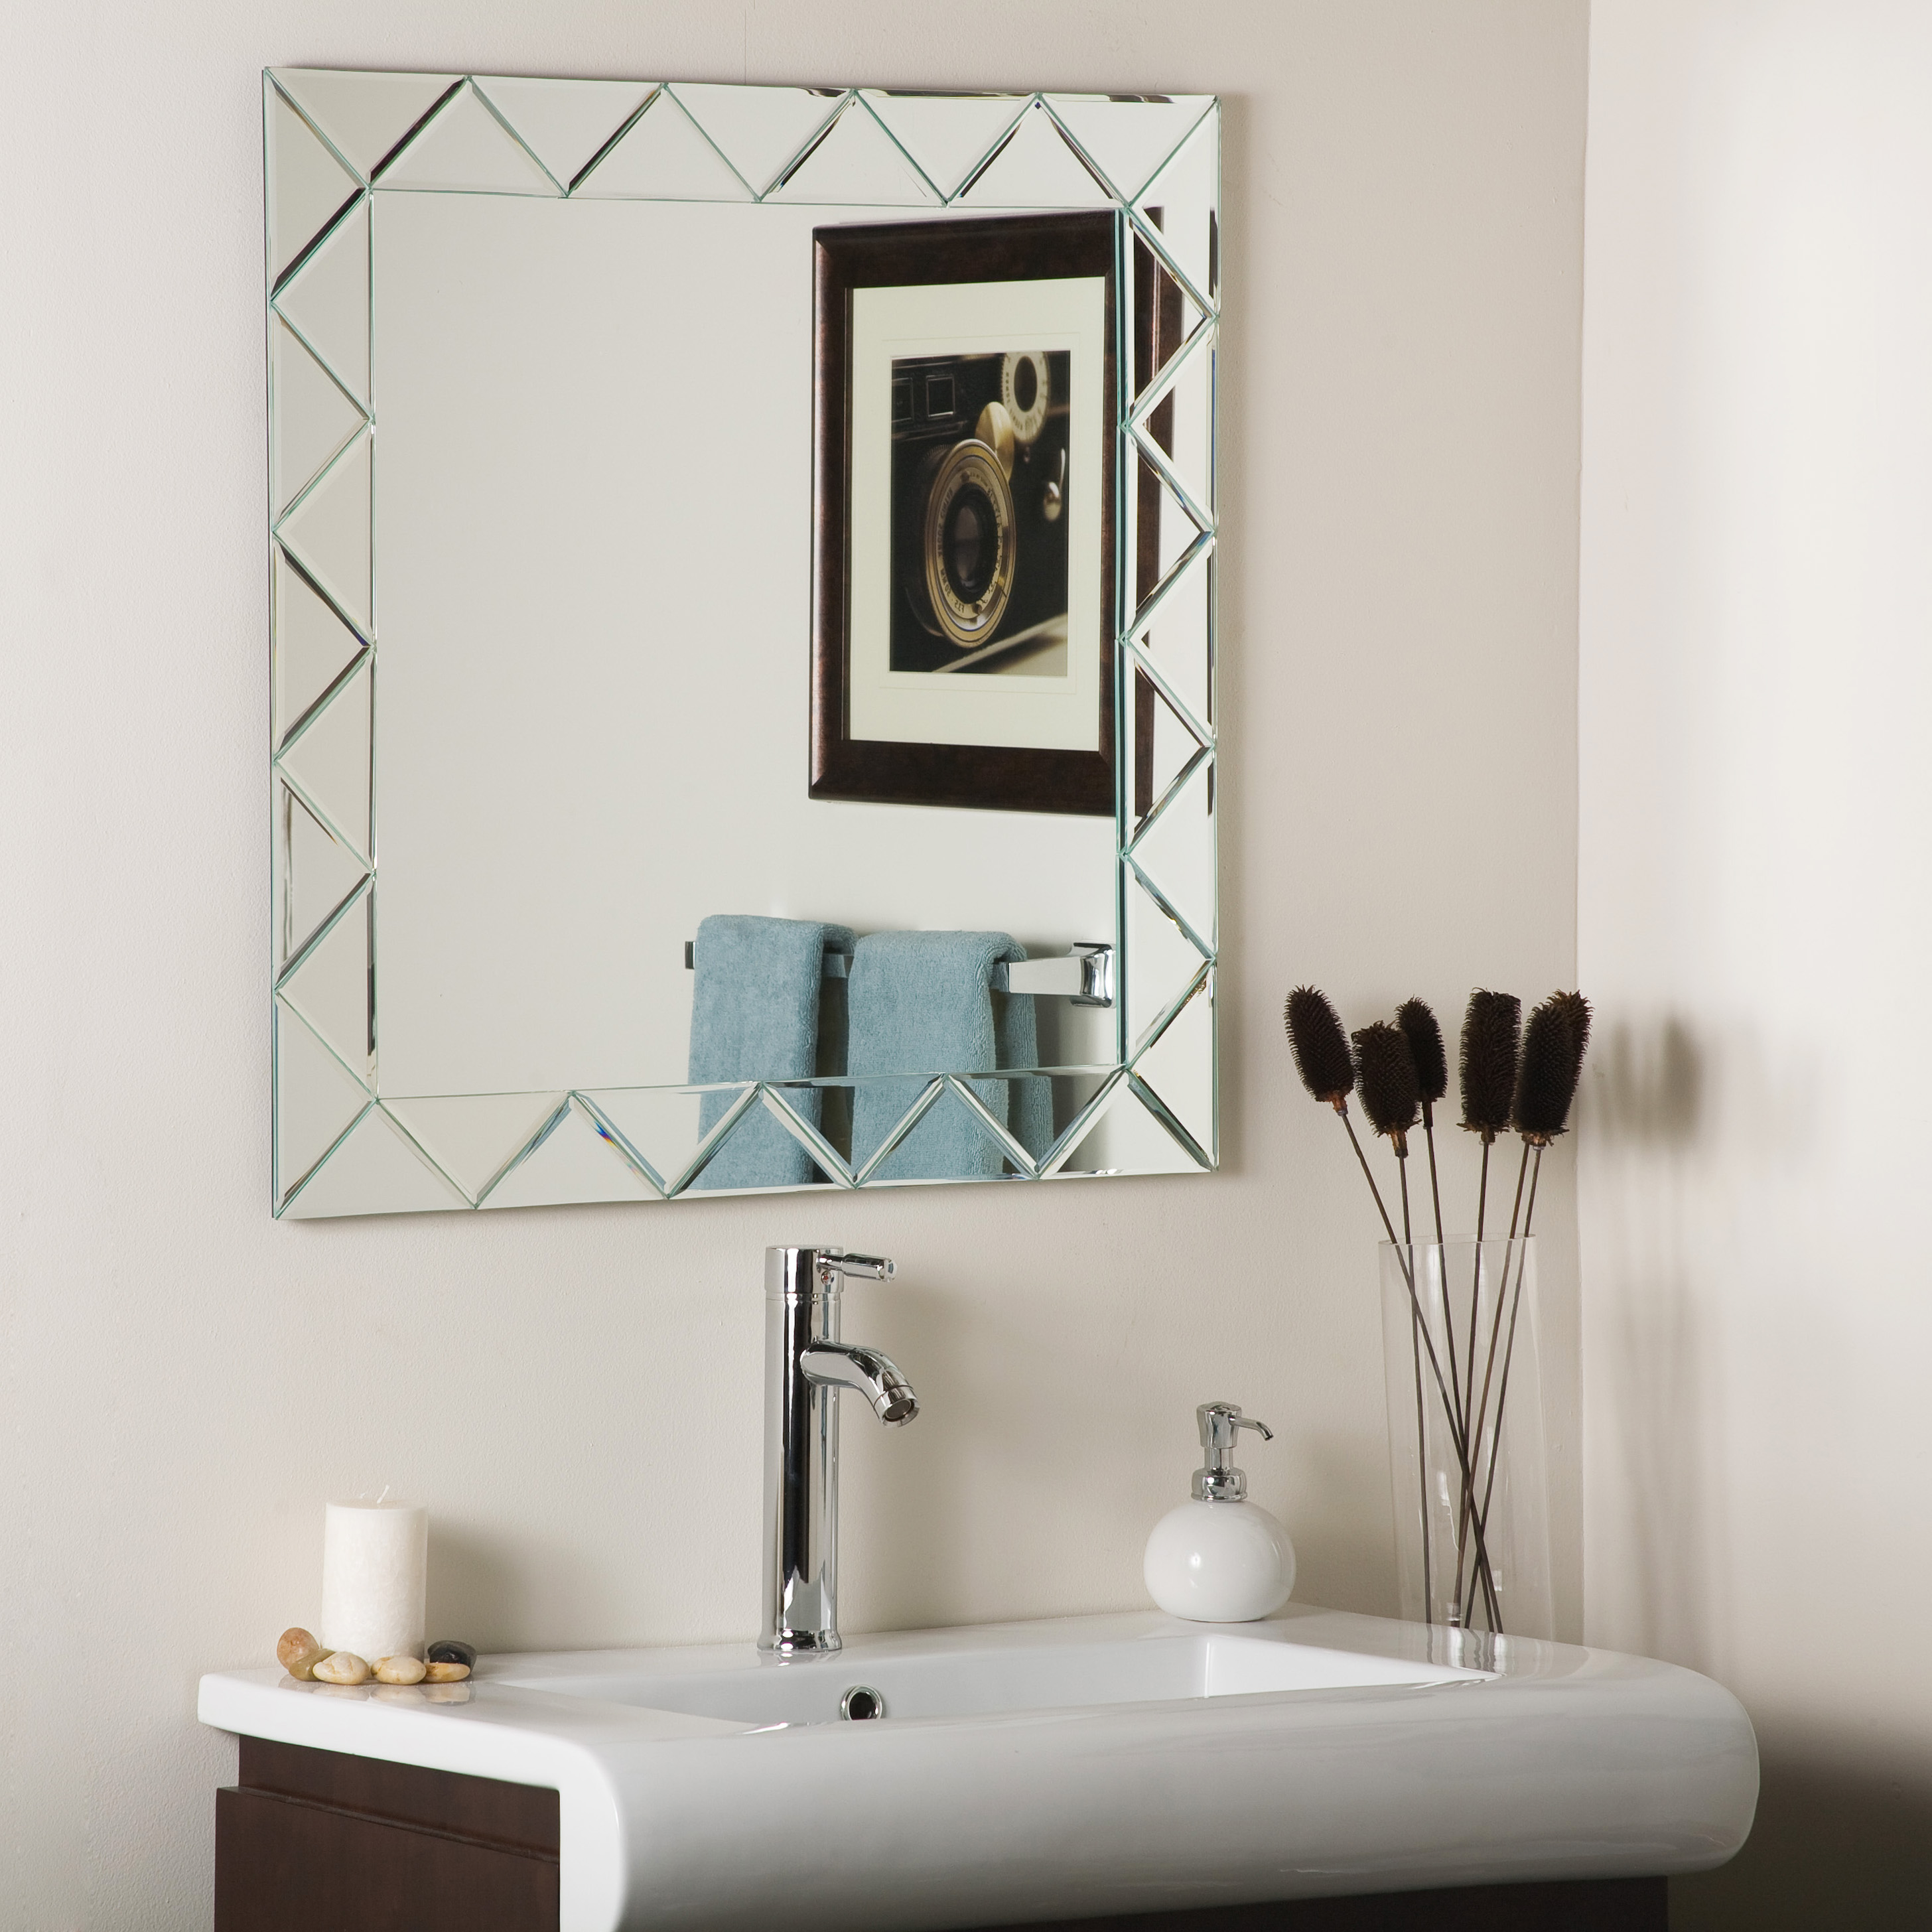 Décor Wonderland Luciano Frameless Wall Mirror 27.6 inx27.6 in